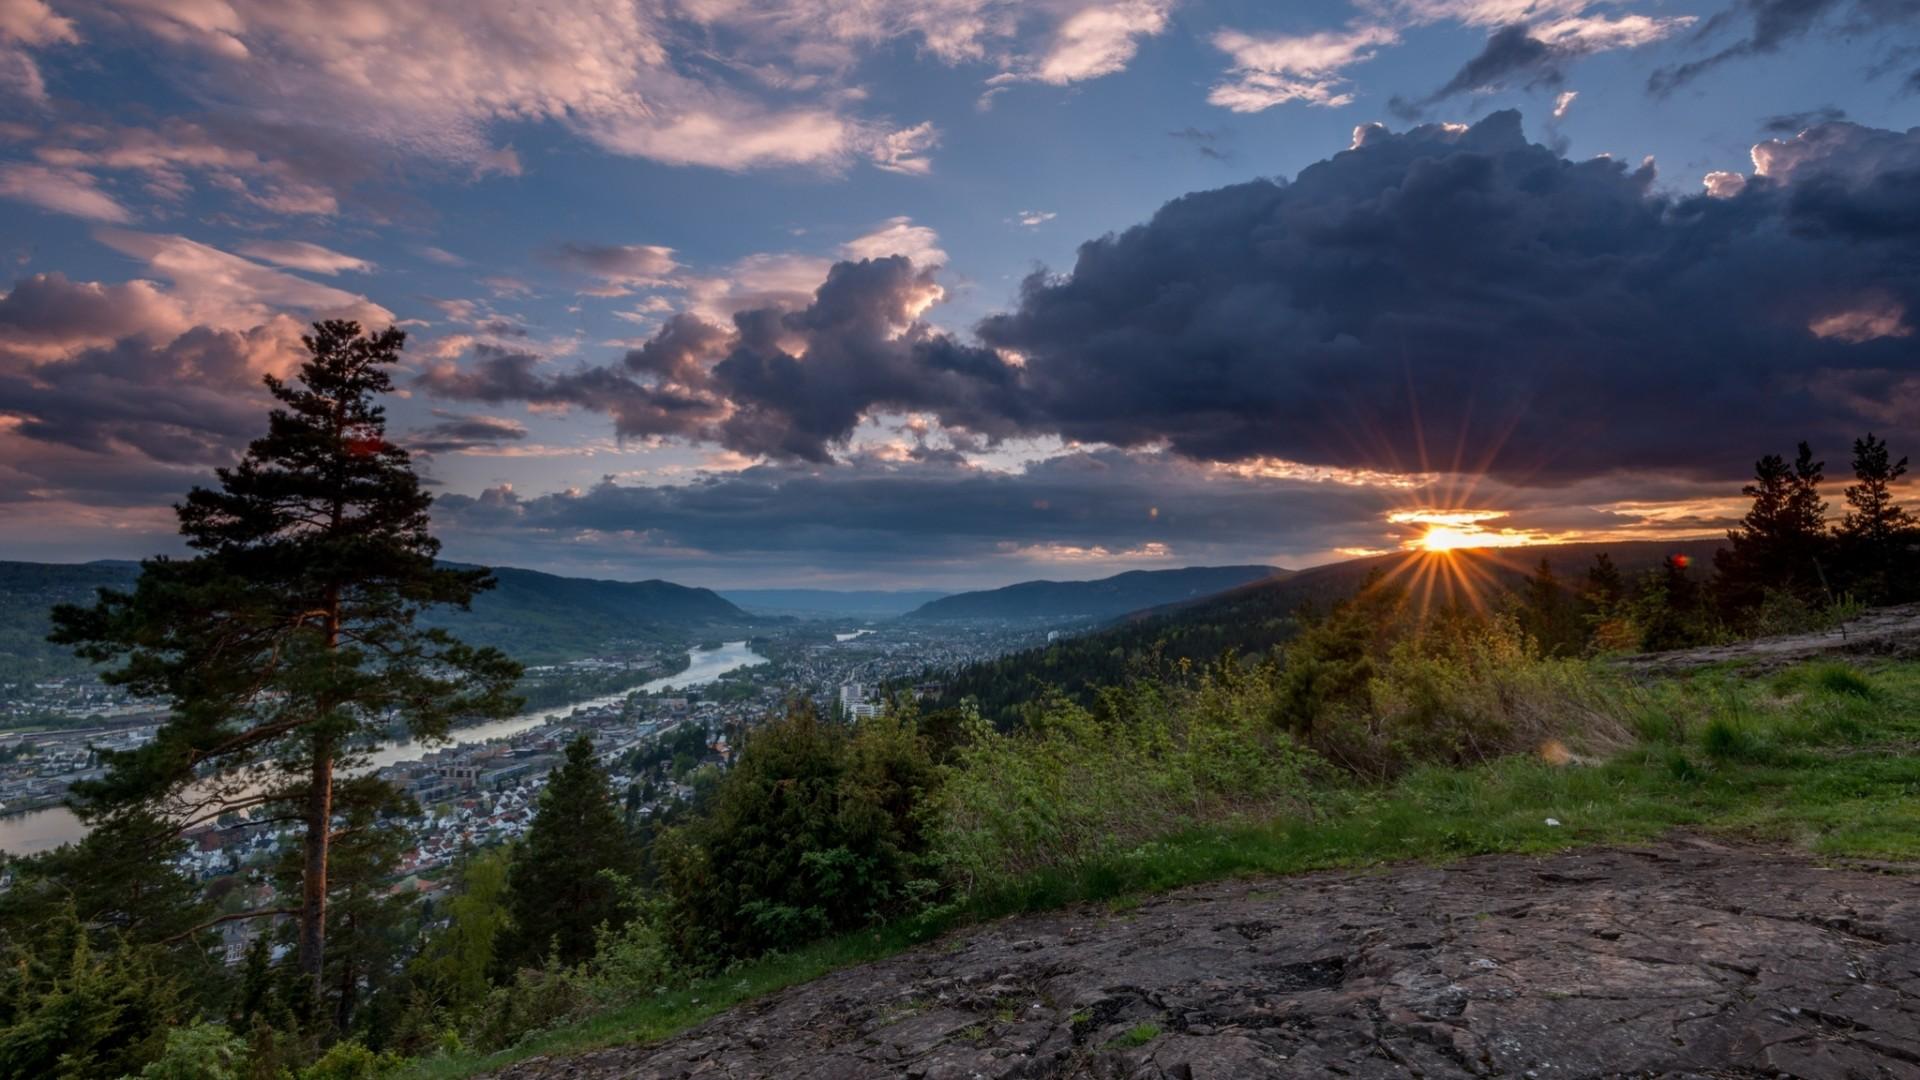 закат склон sunset the slope  № 1569302 загрузить